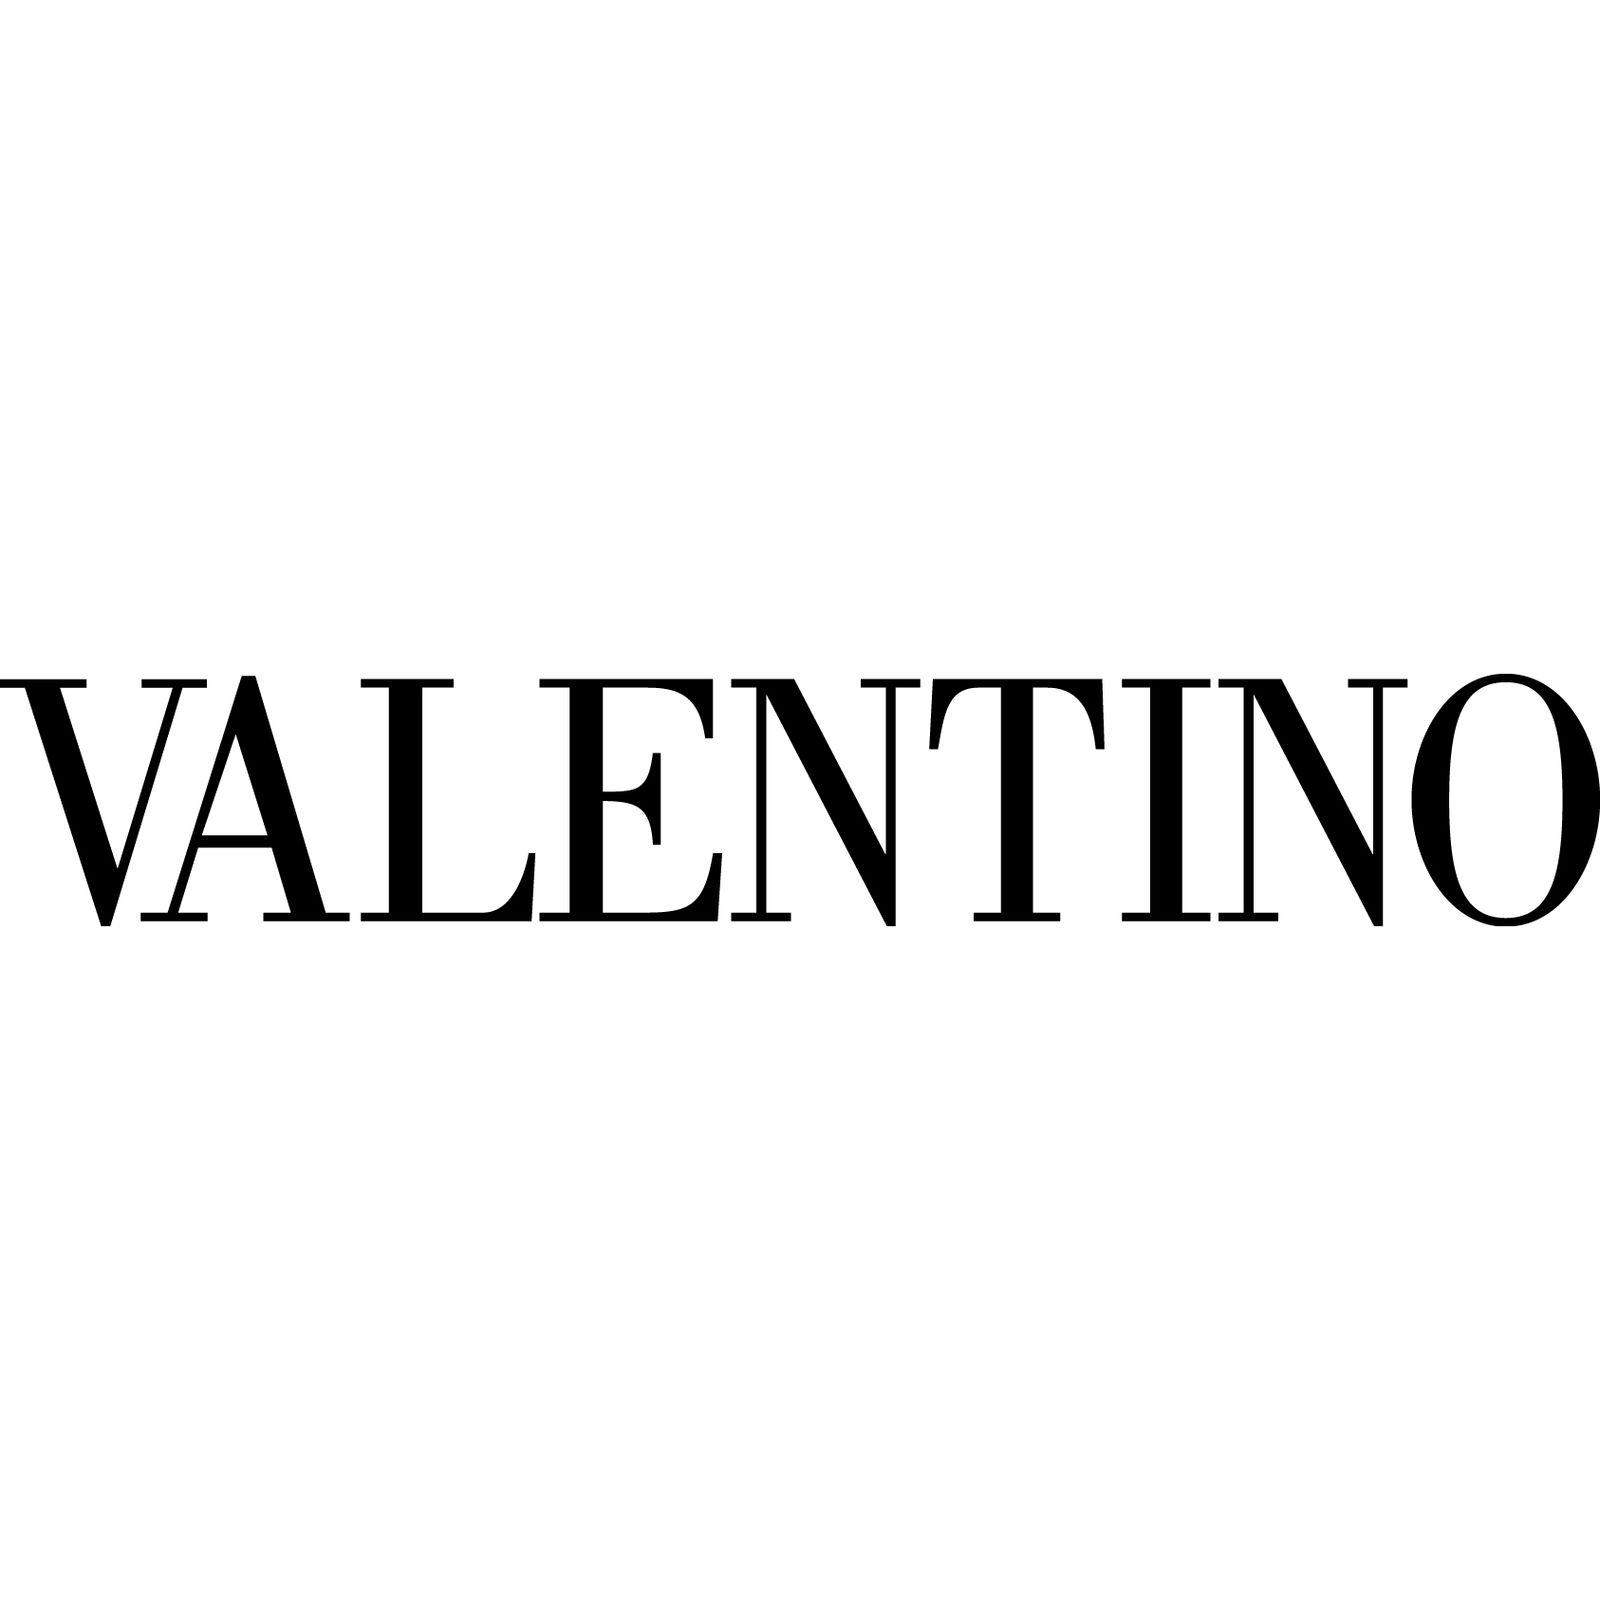 VALENTINO (Image 1)